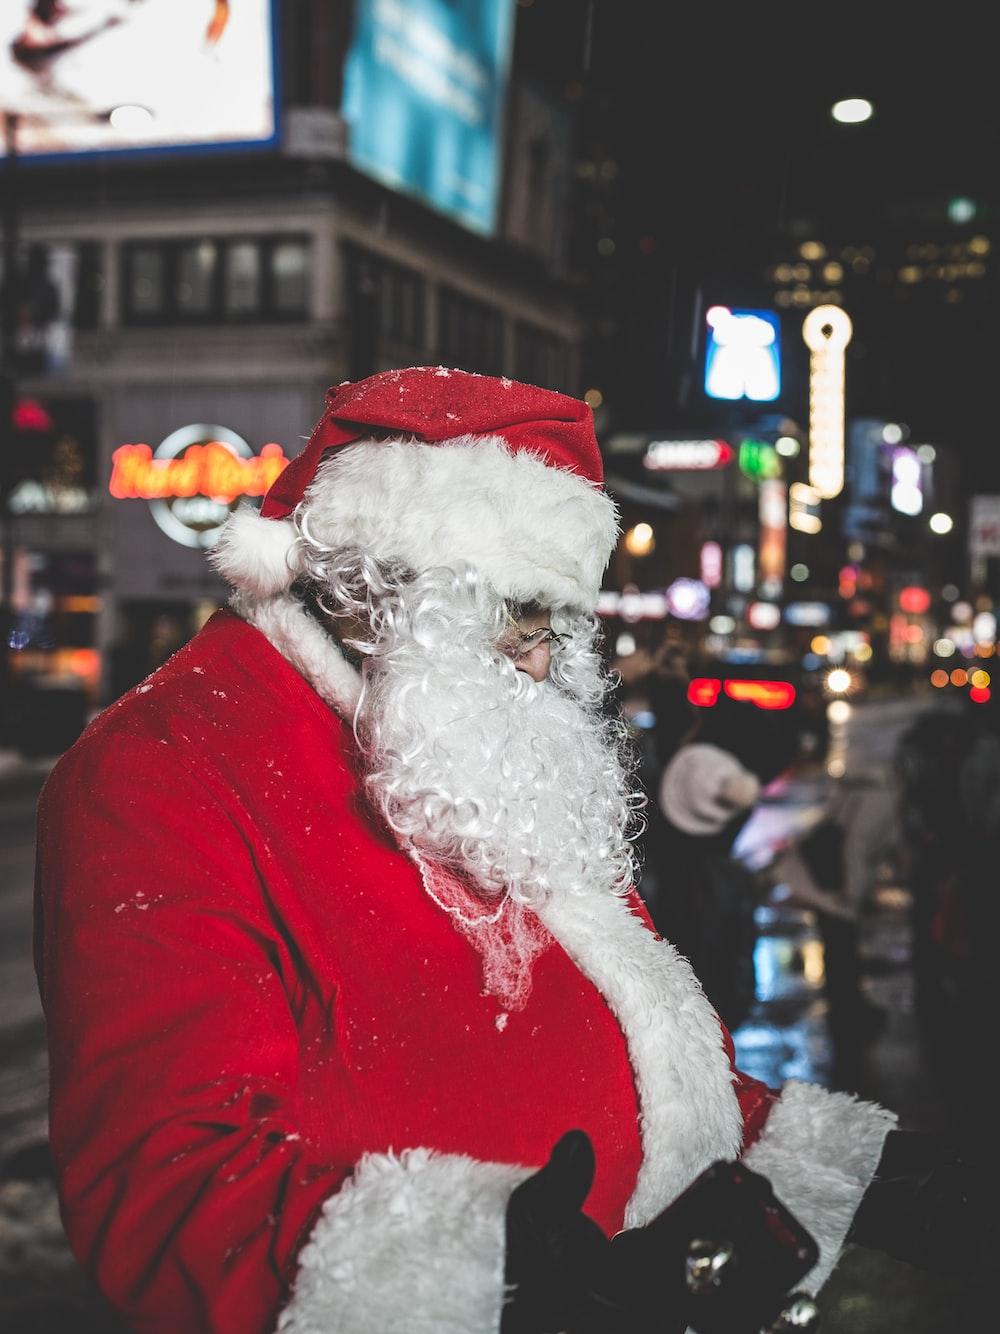 Santa Claus standing near buildings